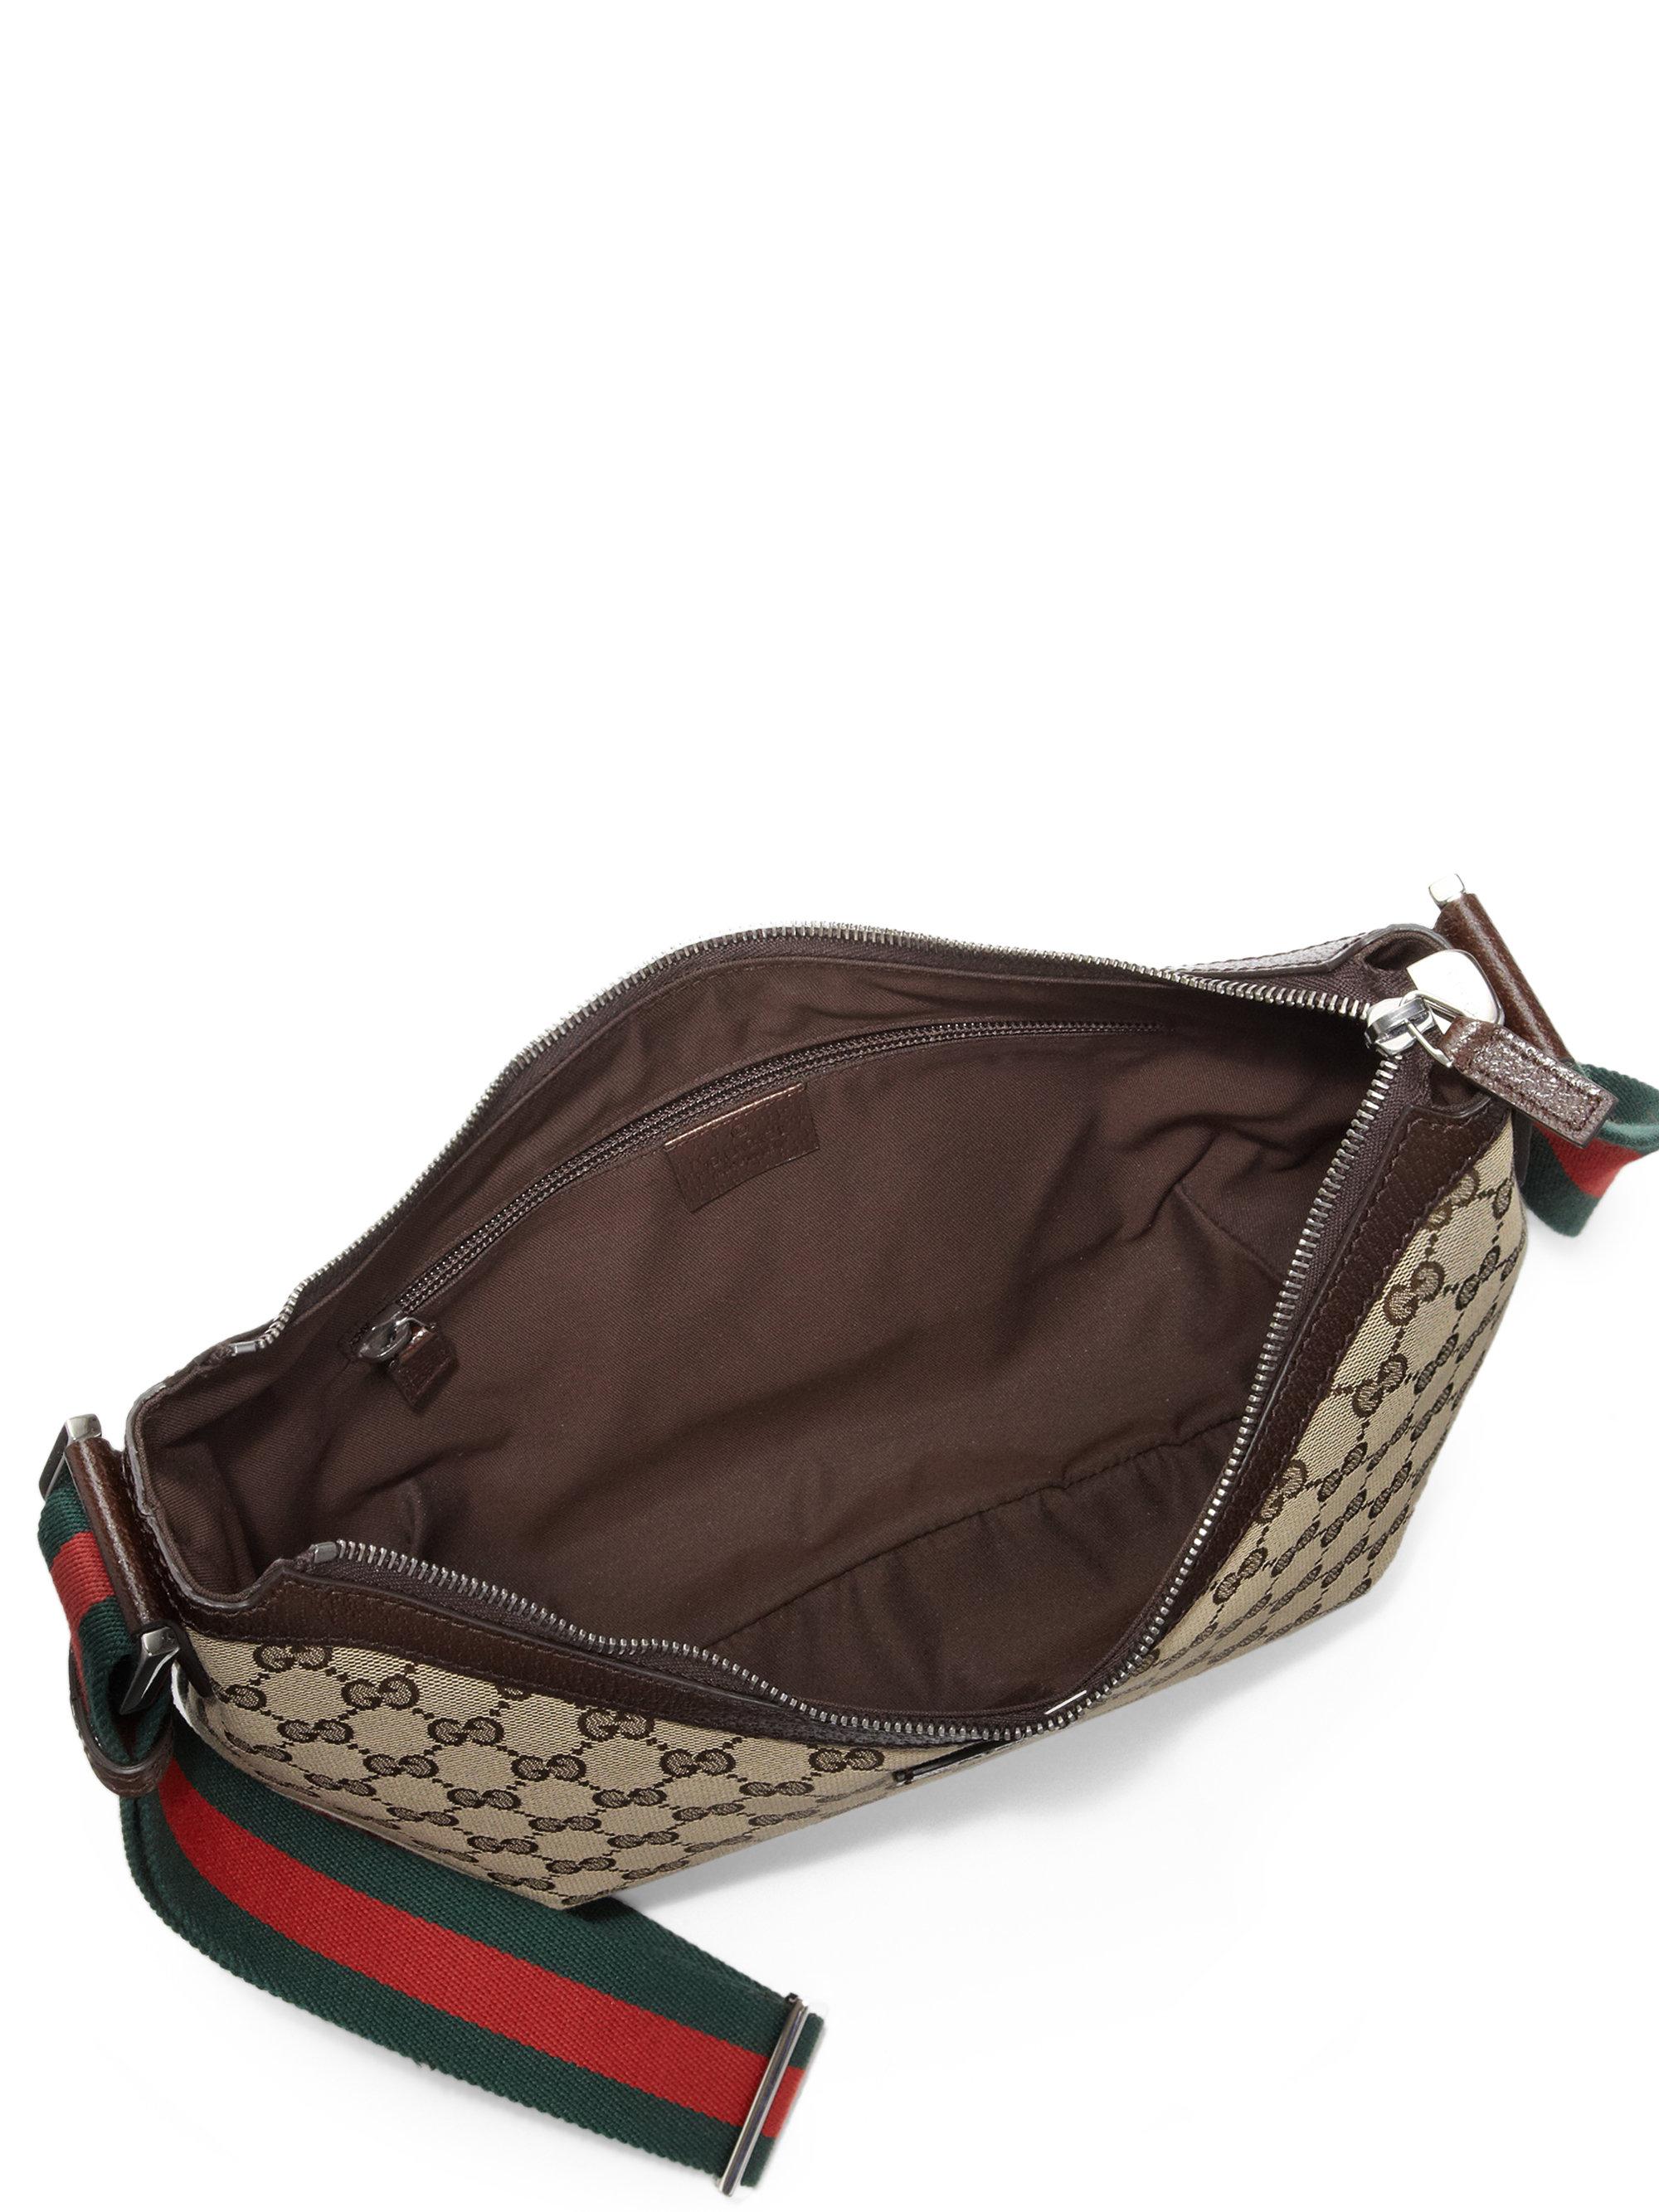 1f2c04a6850 Lyst - Gucci Original Gg Canvas Messenger Bag in Brown